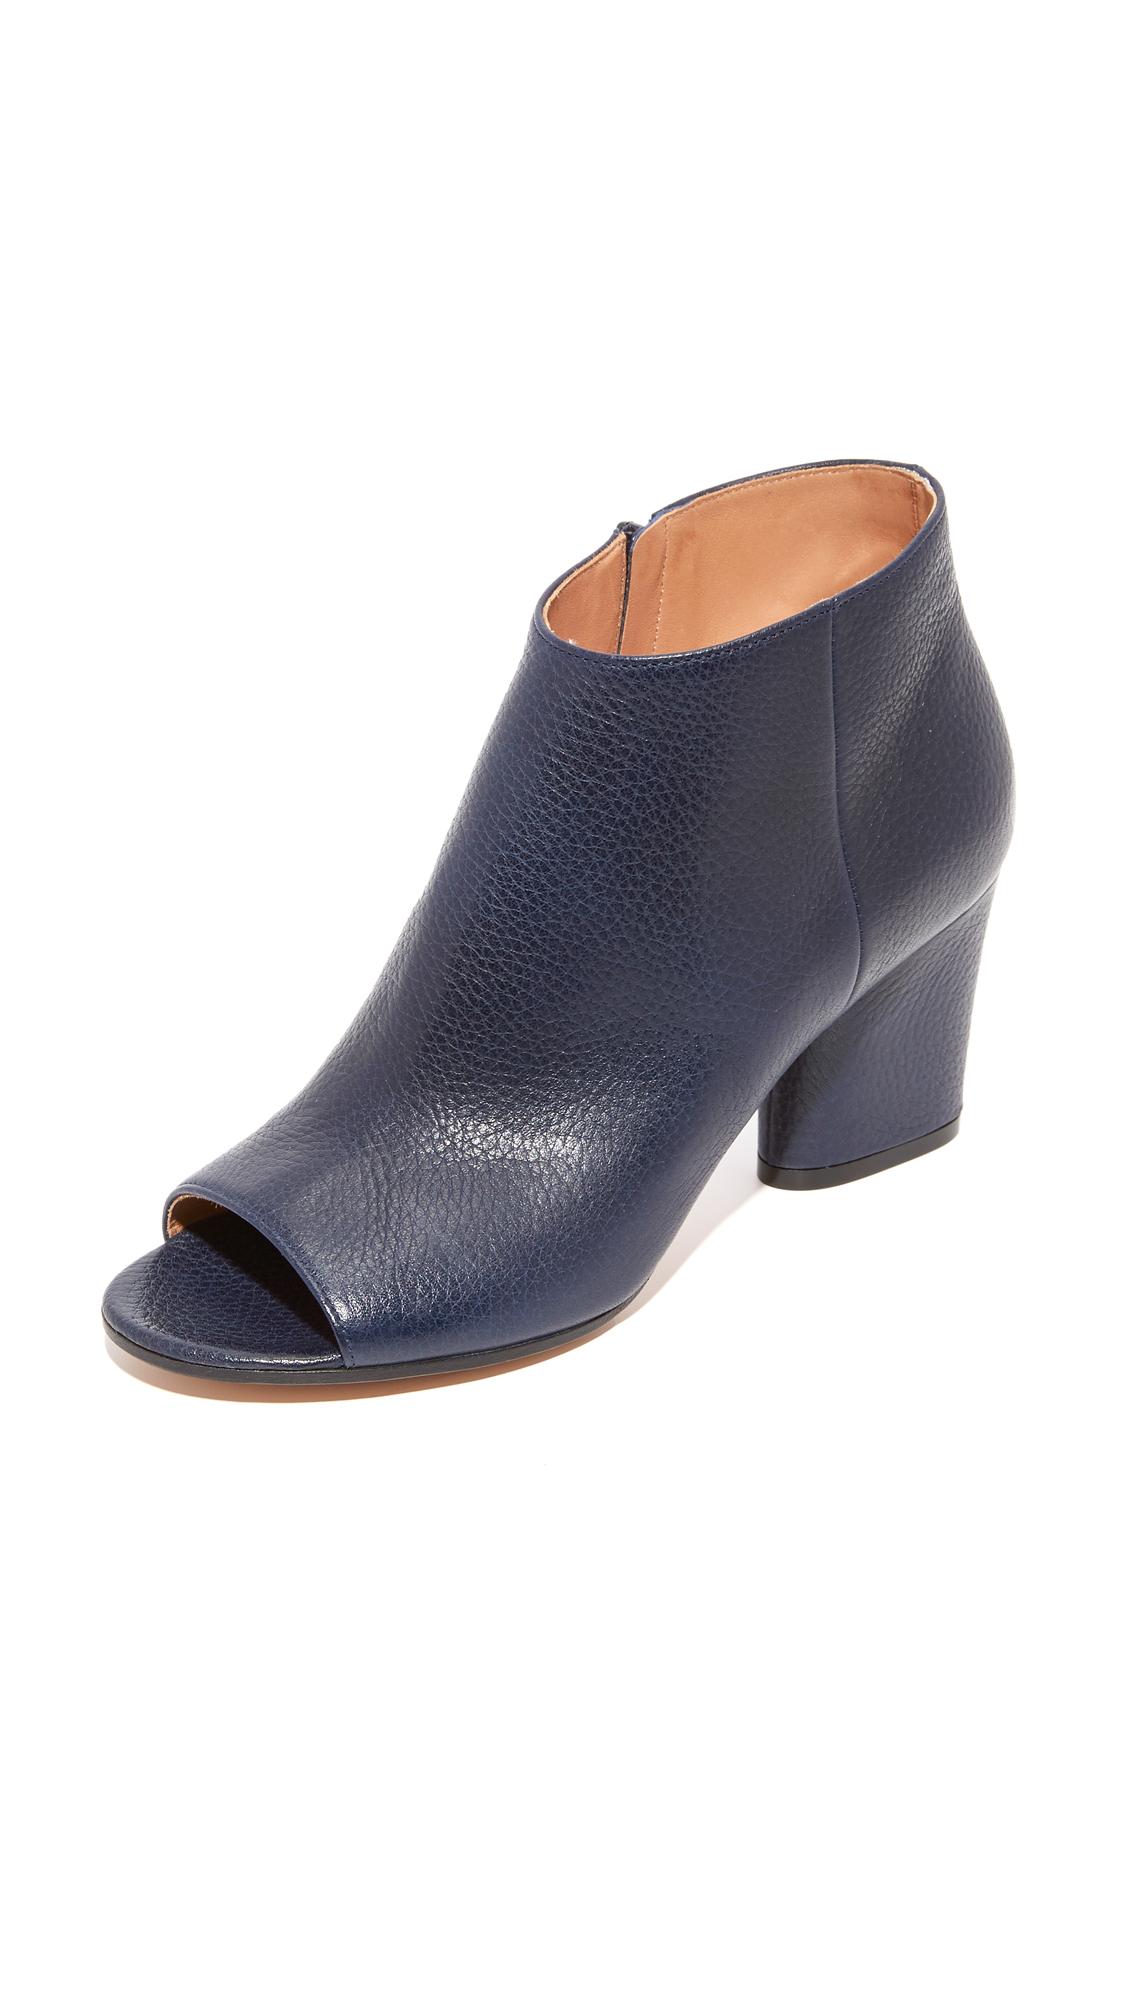 Maison Margiela Leather Booties - Navy